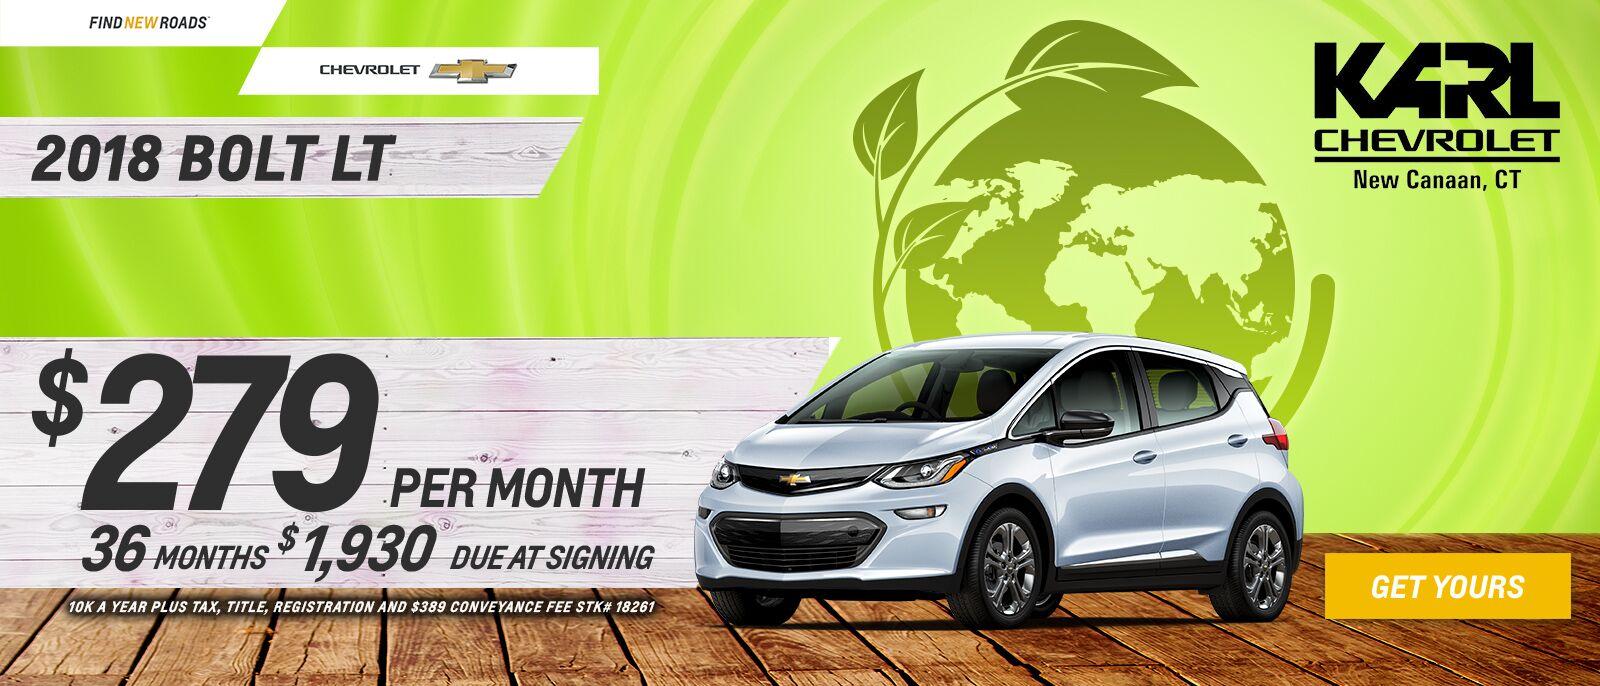 HONESTY INTEGRITY SERVICE TRUST | Karl Chevrolet Helping ...